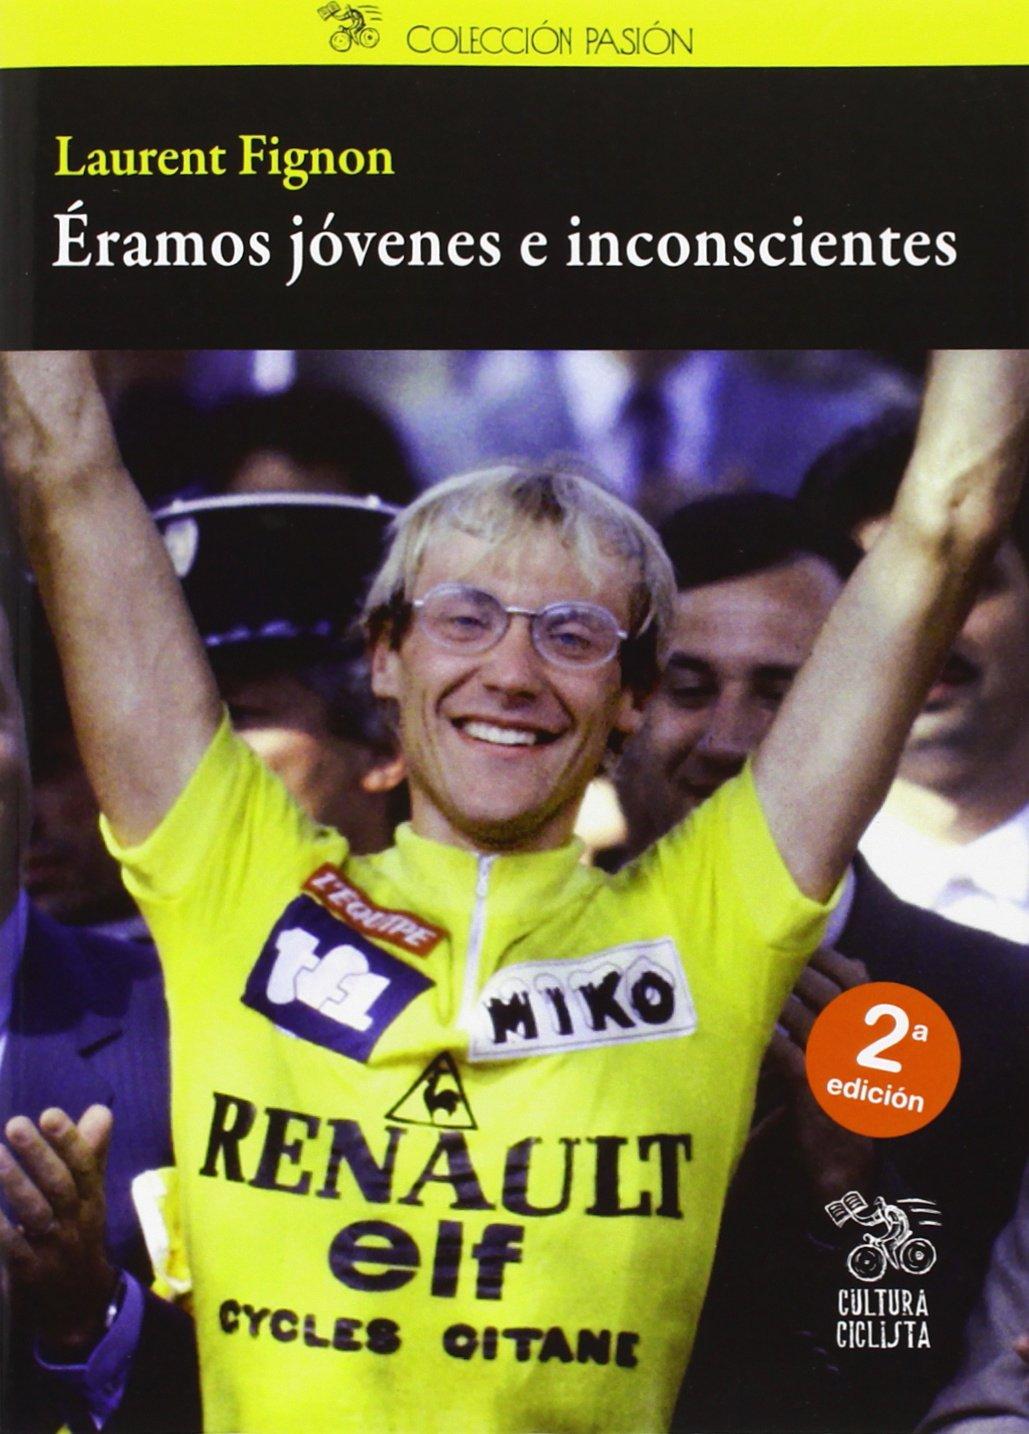 71Z1bFlPNqL - Libros de Ciclismo